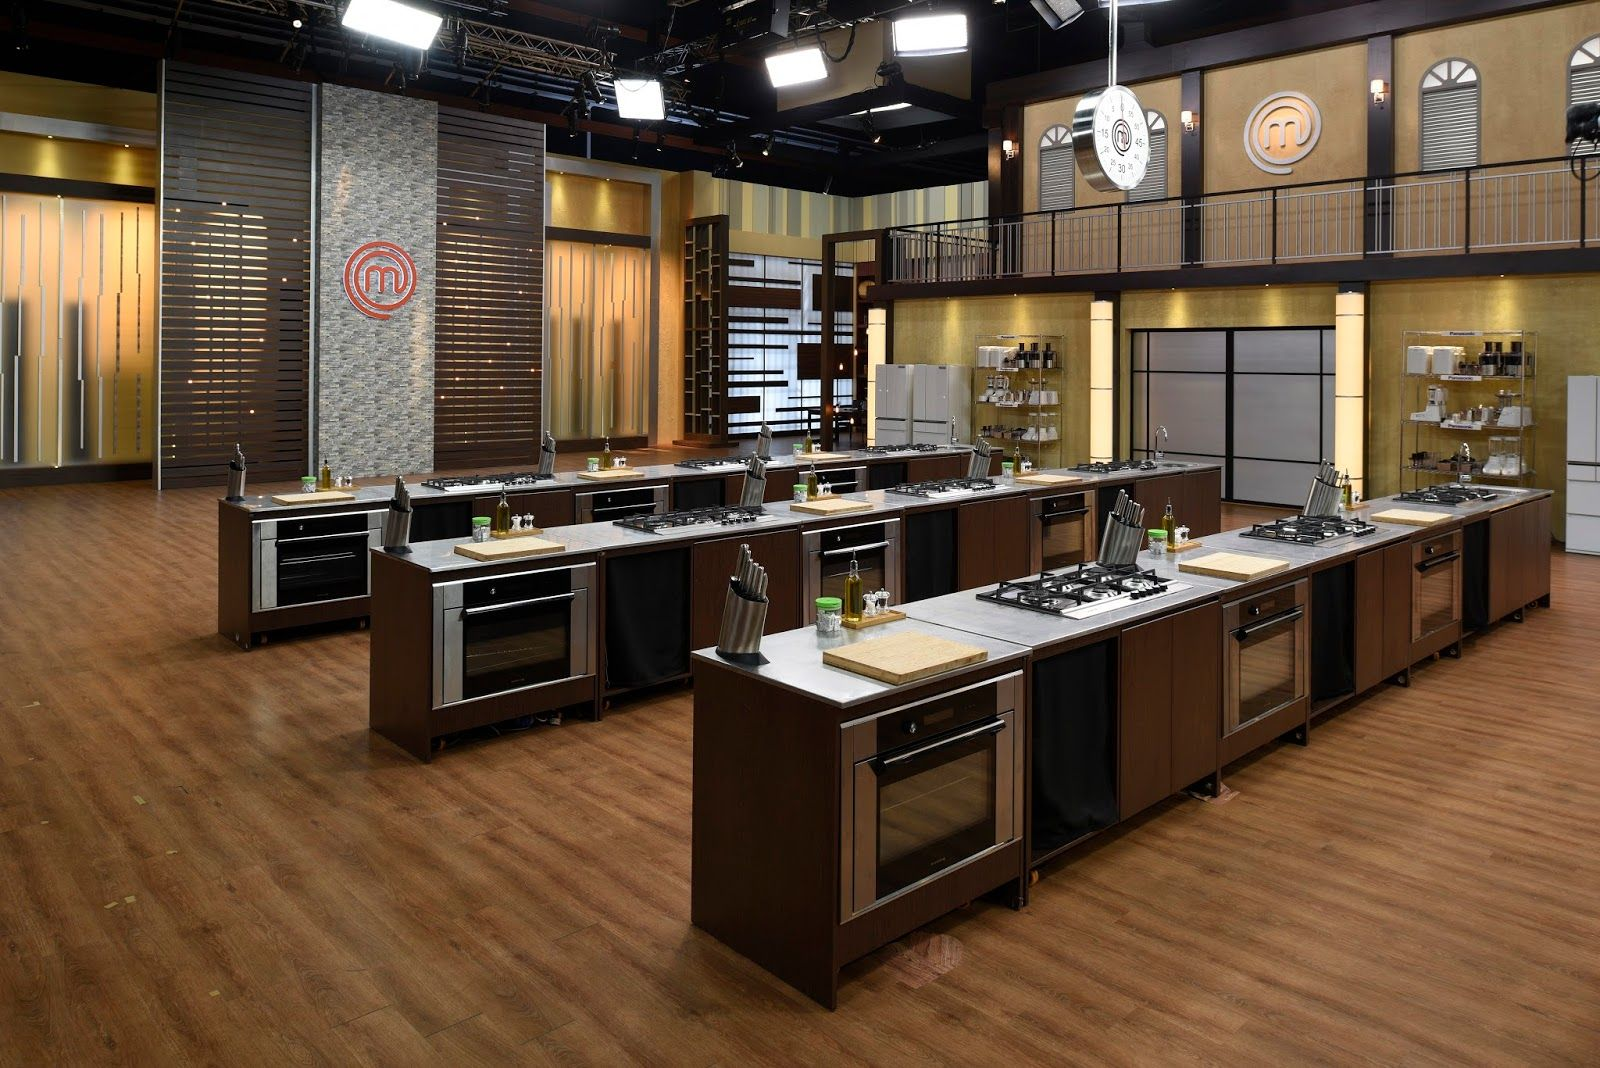 masterchef kitchen - Google Search   Mid-Victorian Remodel ...